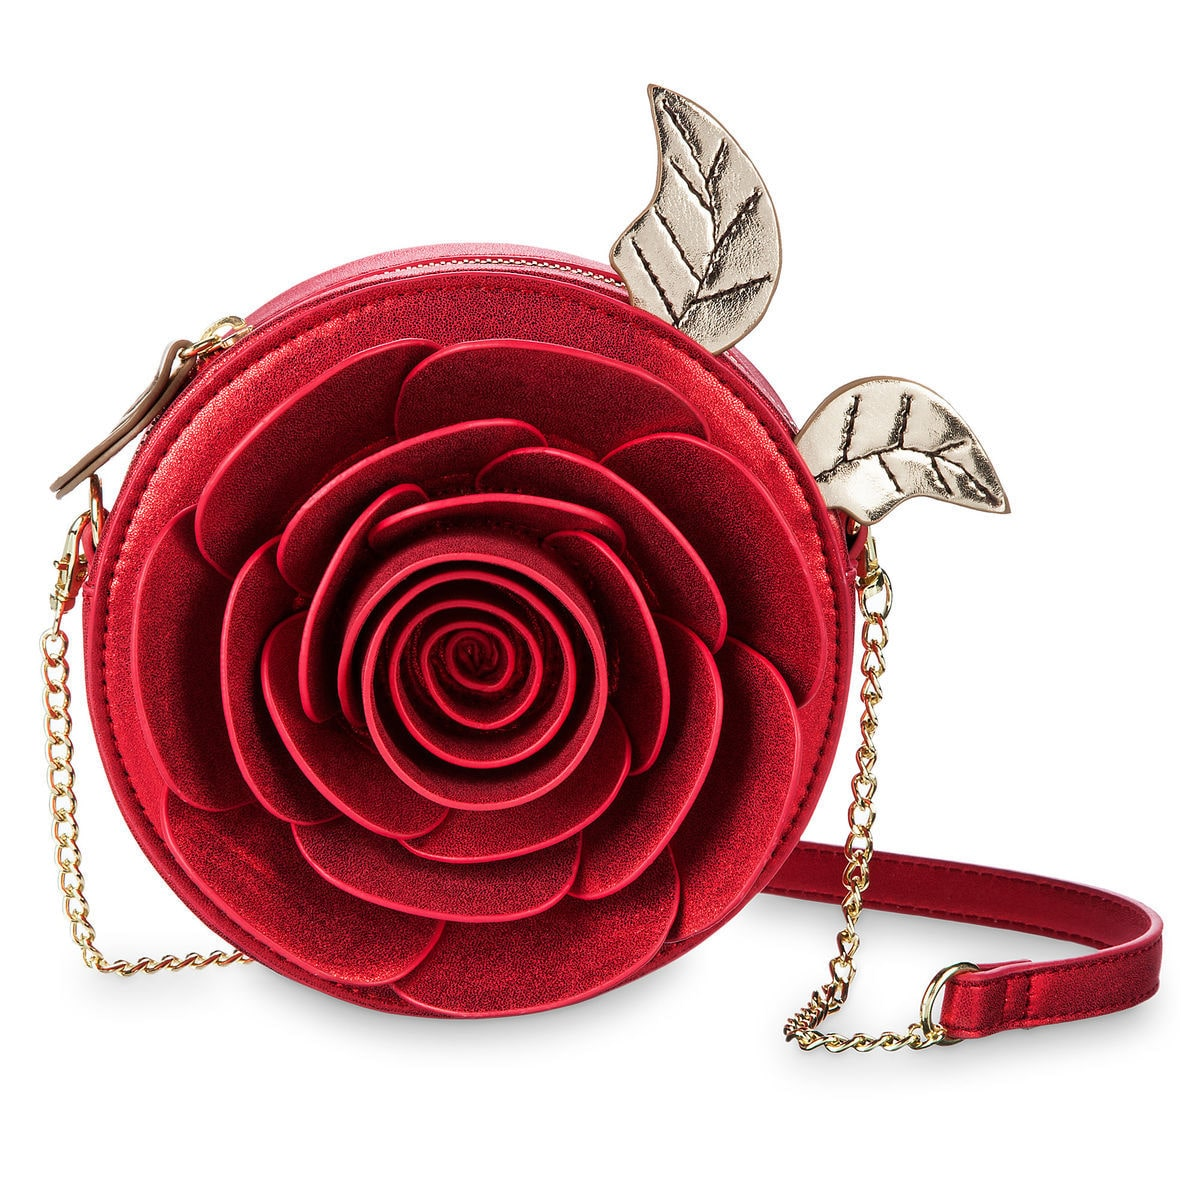 Beauty and the beast enchanted rose crossbody bag by danielle nicole product image of beauty and the beast enchanted rose crossbody bag by danielle nicole 1 izmirmasajfo